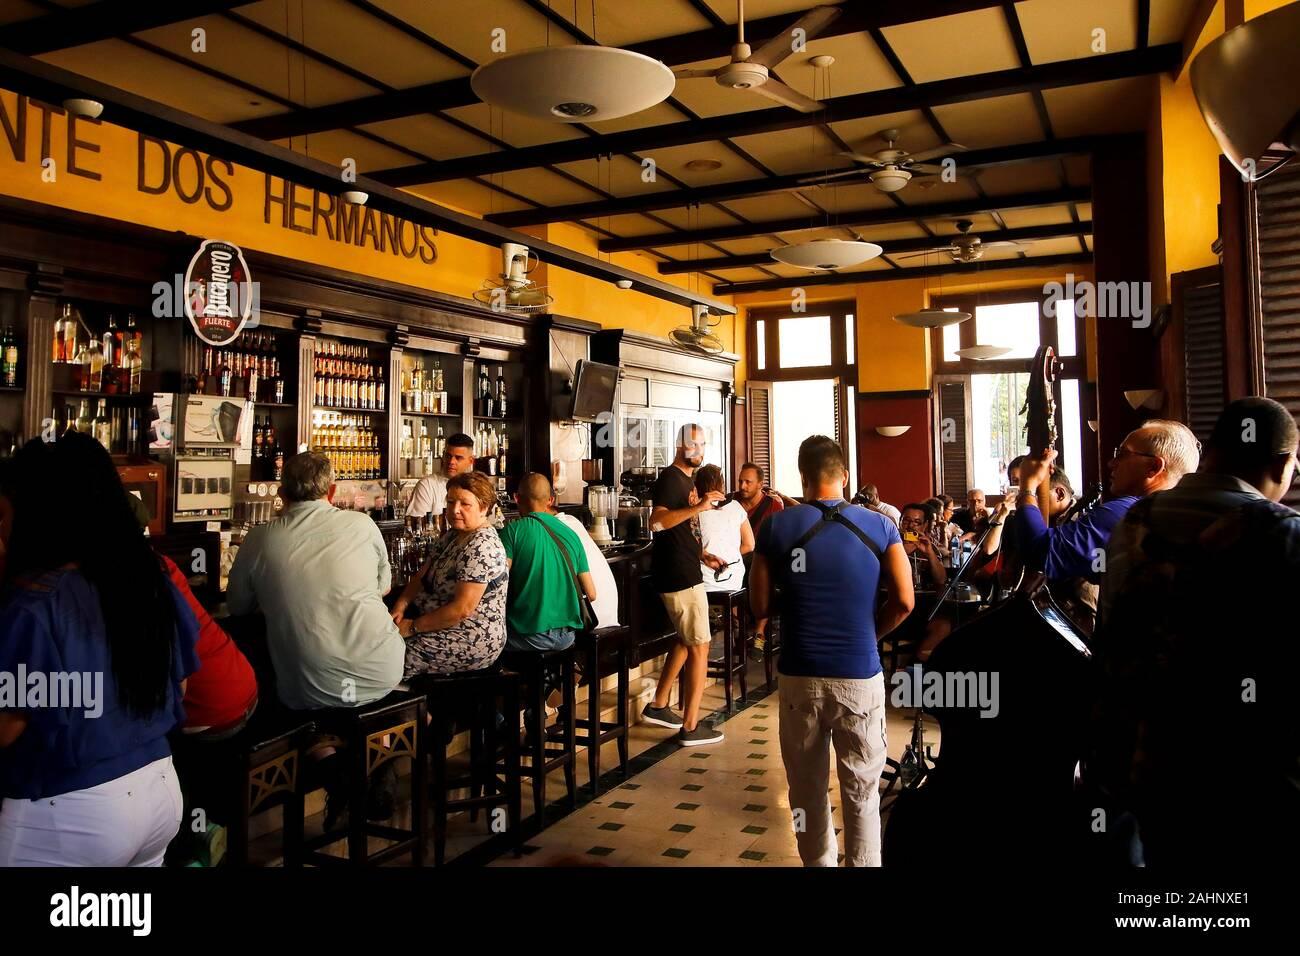 Banda tocando en un restaurante. La Habana. Cuba Foto de stock